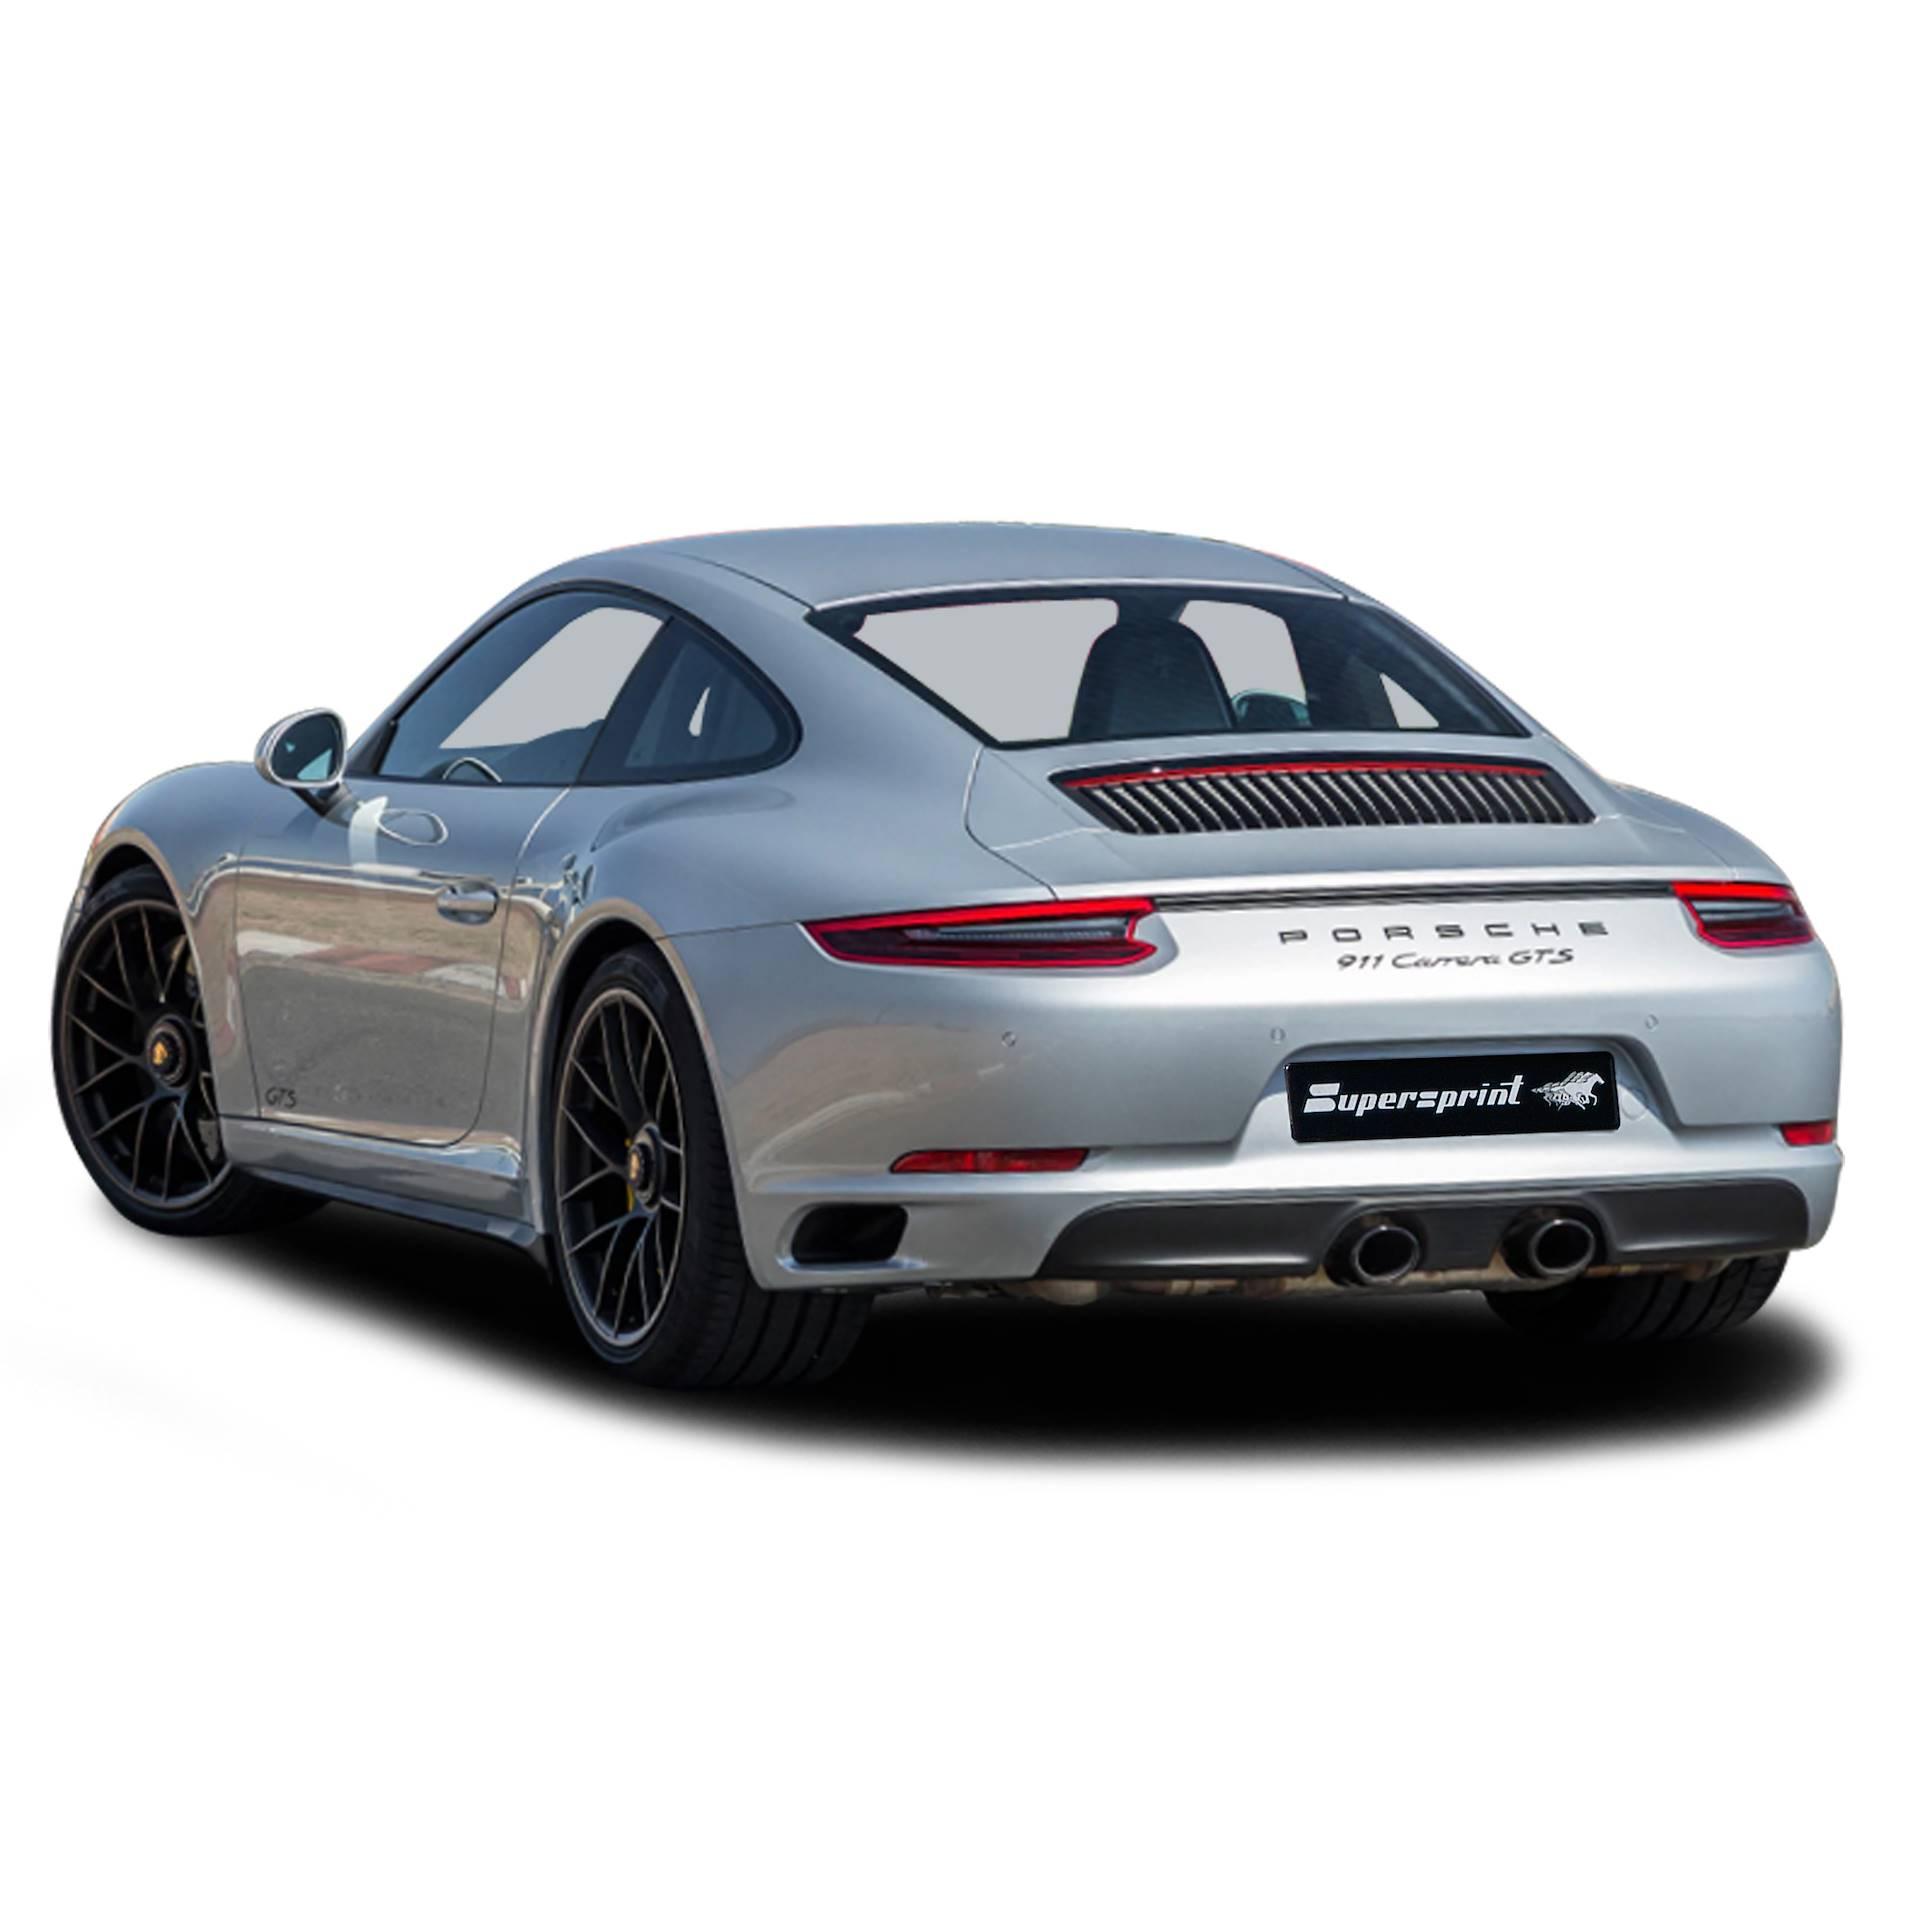 Performance Sport Exhaust For Porsche 911 991 2 Carrera Gts 3 0i